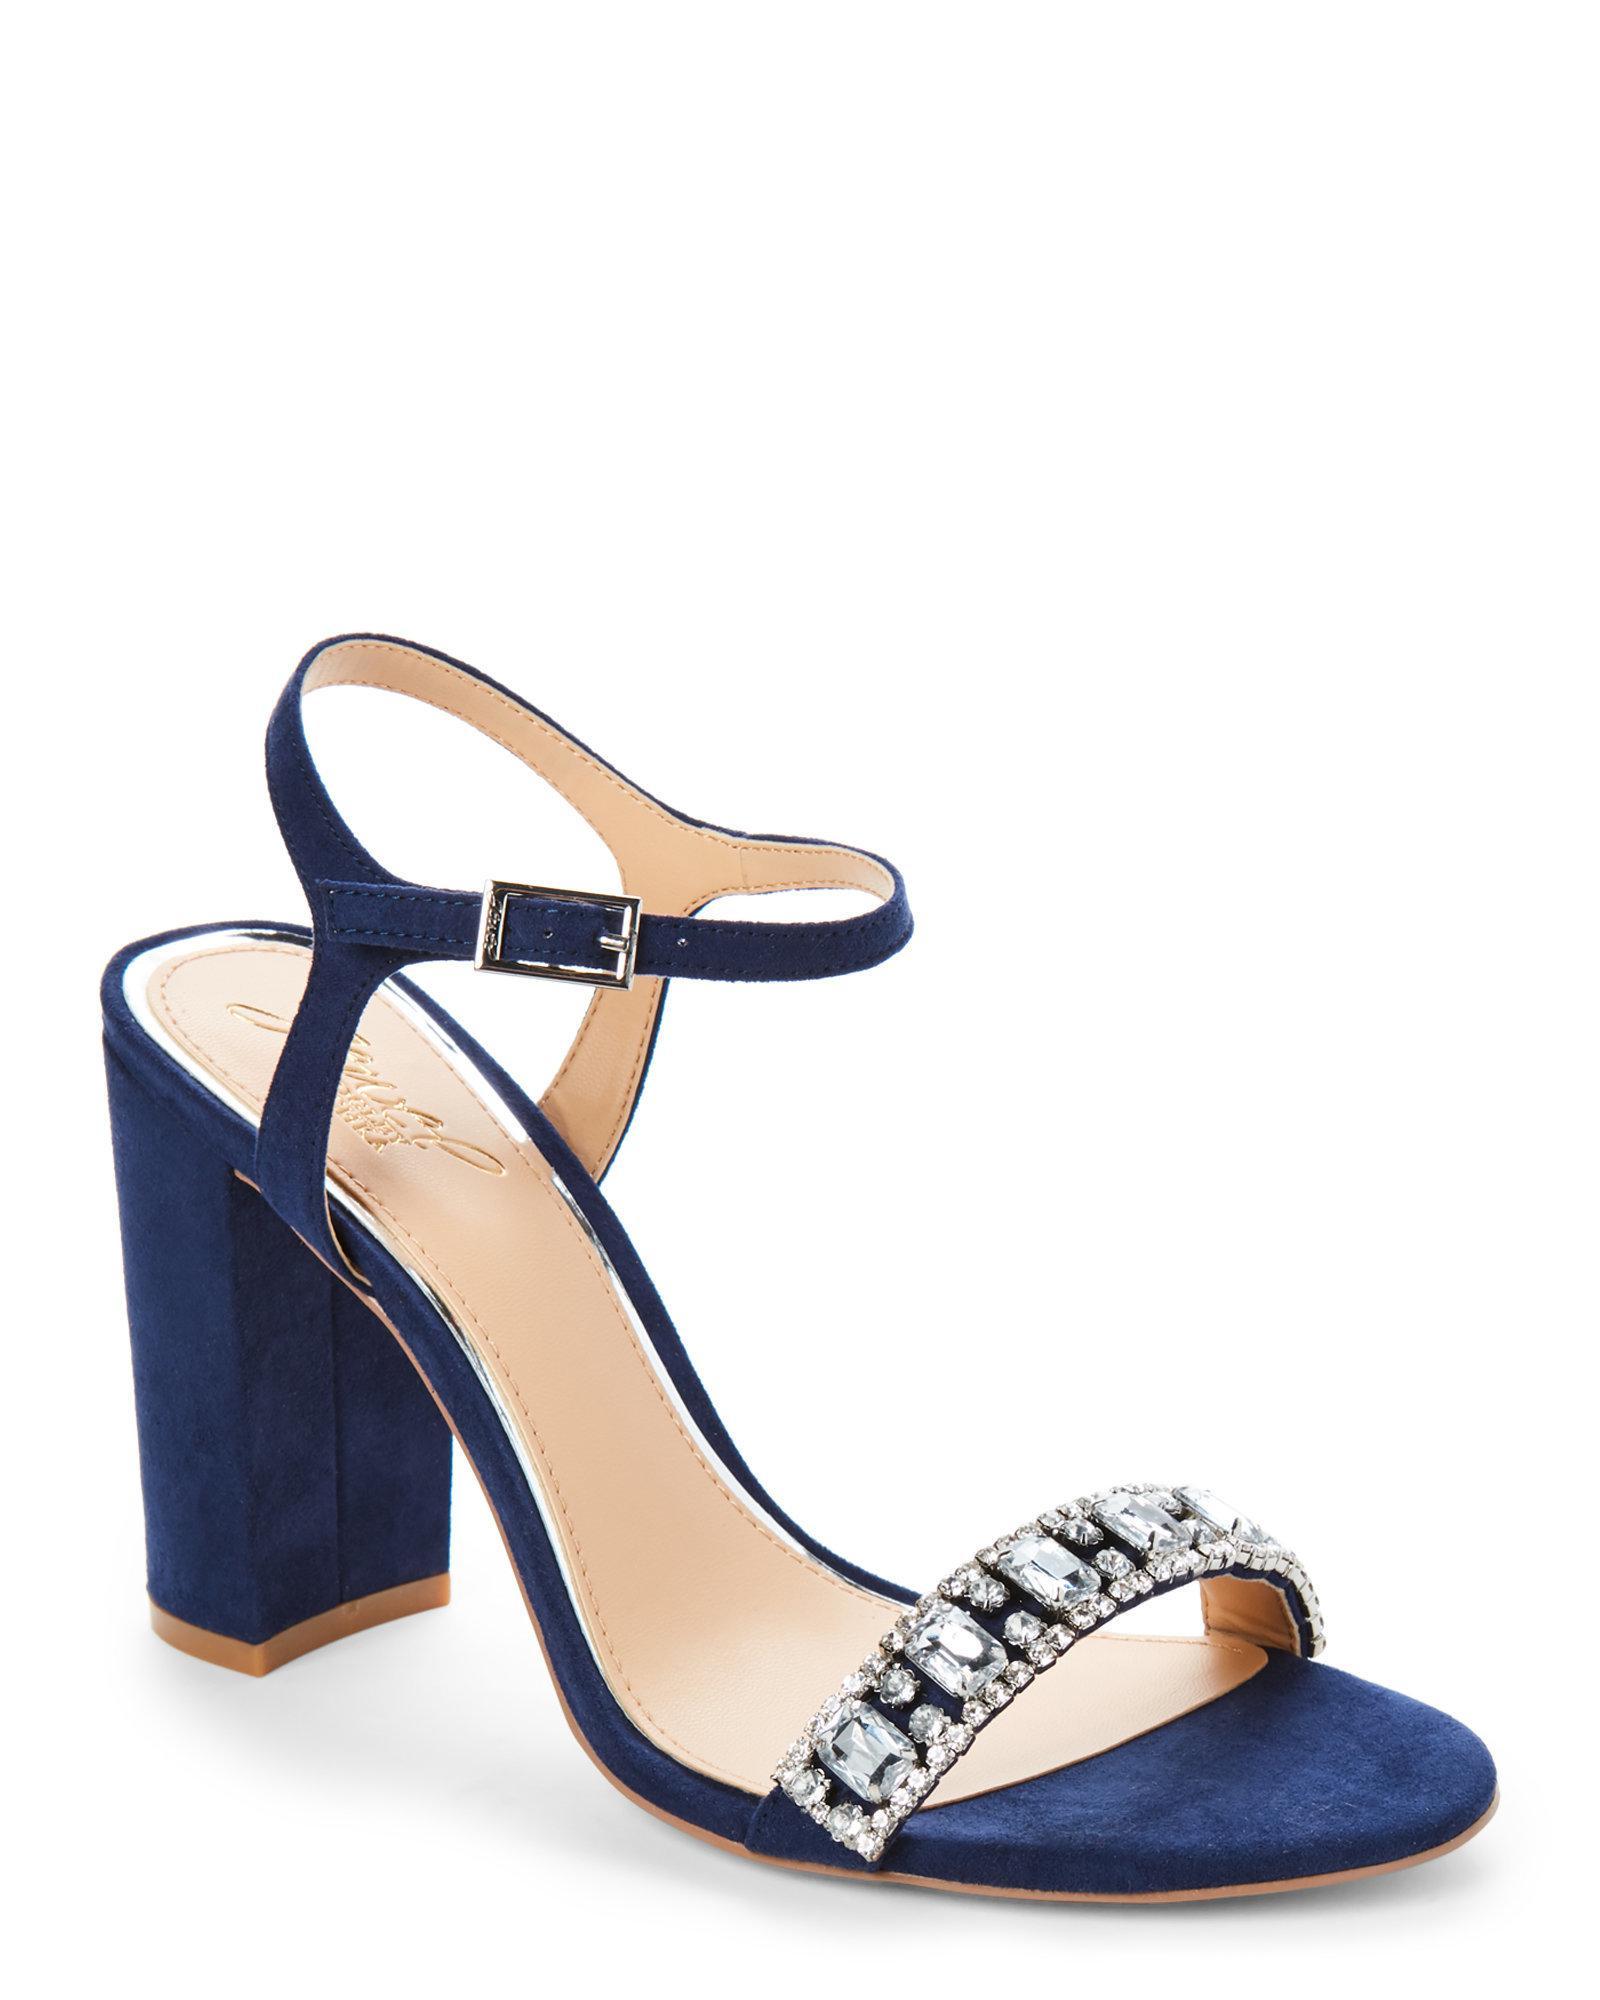 1fb68c57746 Lyst - Badgley Mischka Navy Hendricks Embellished Block Heel Sandals ...